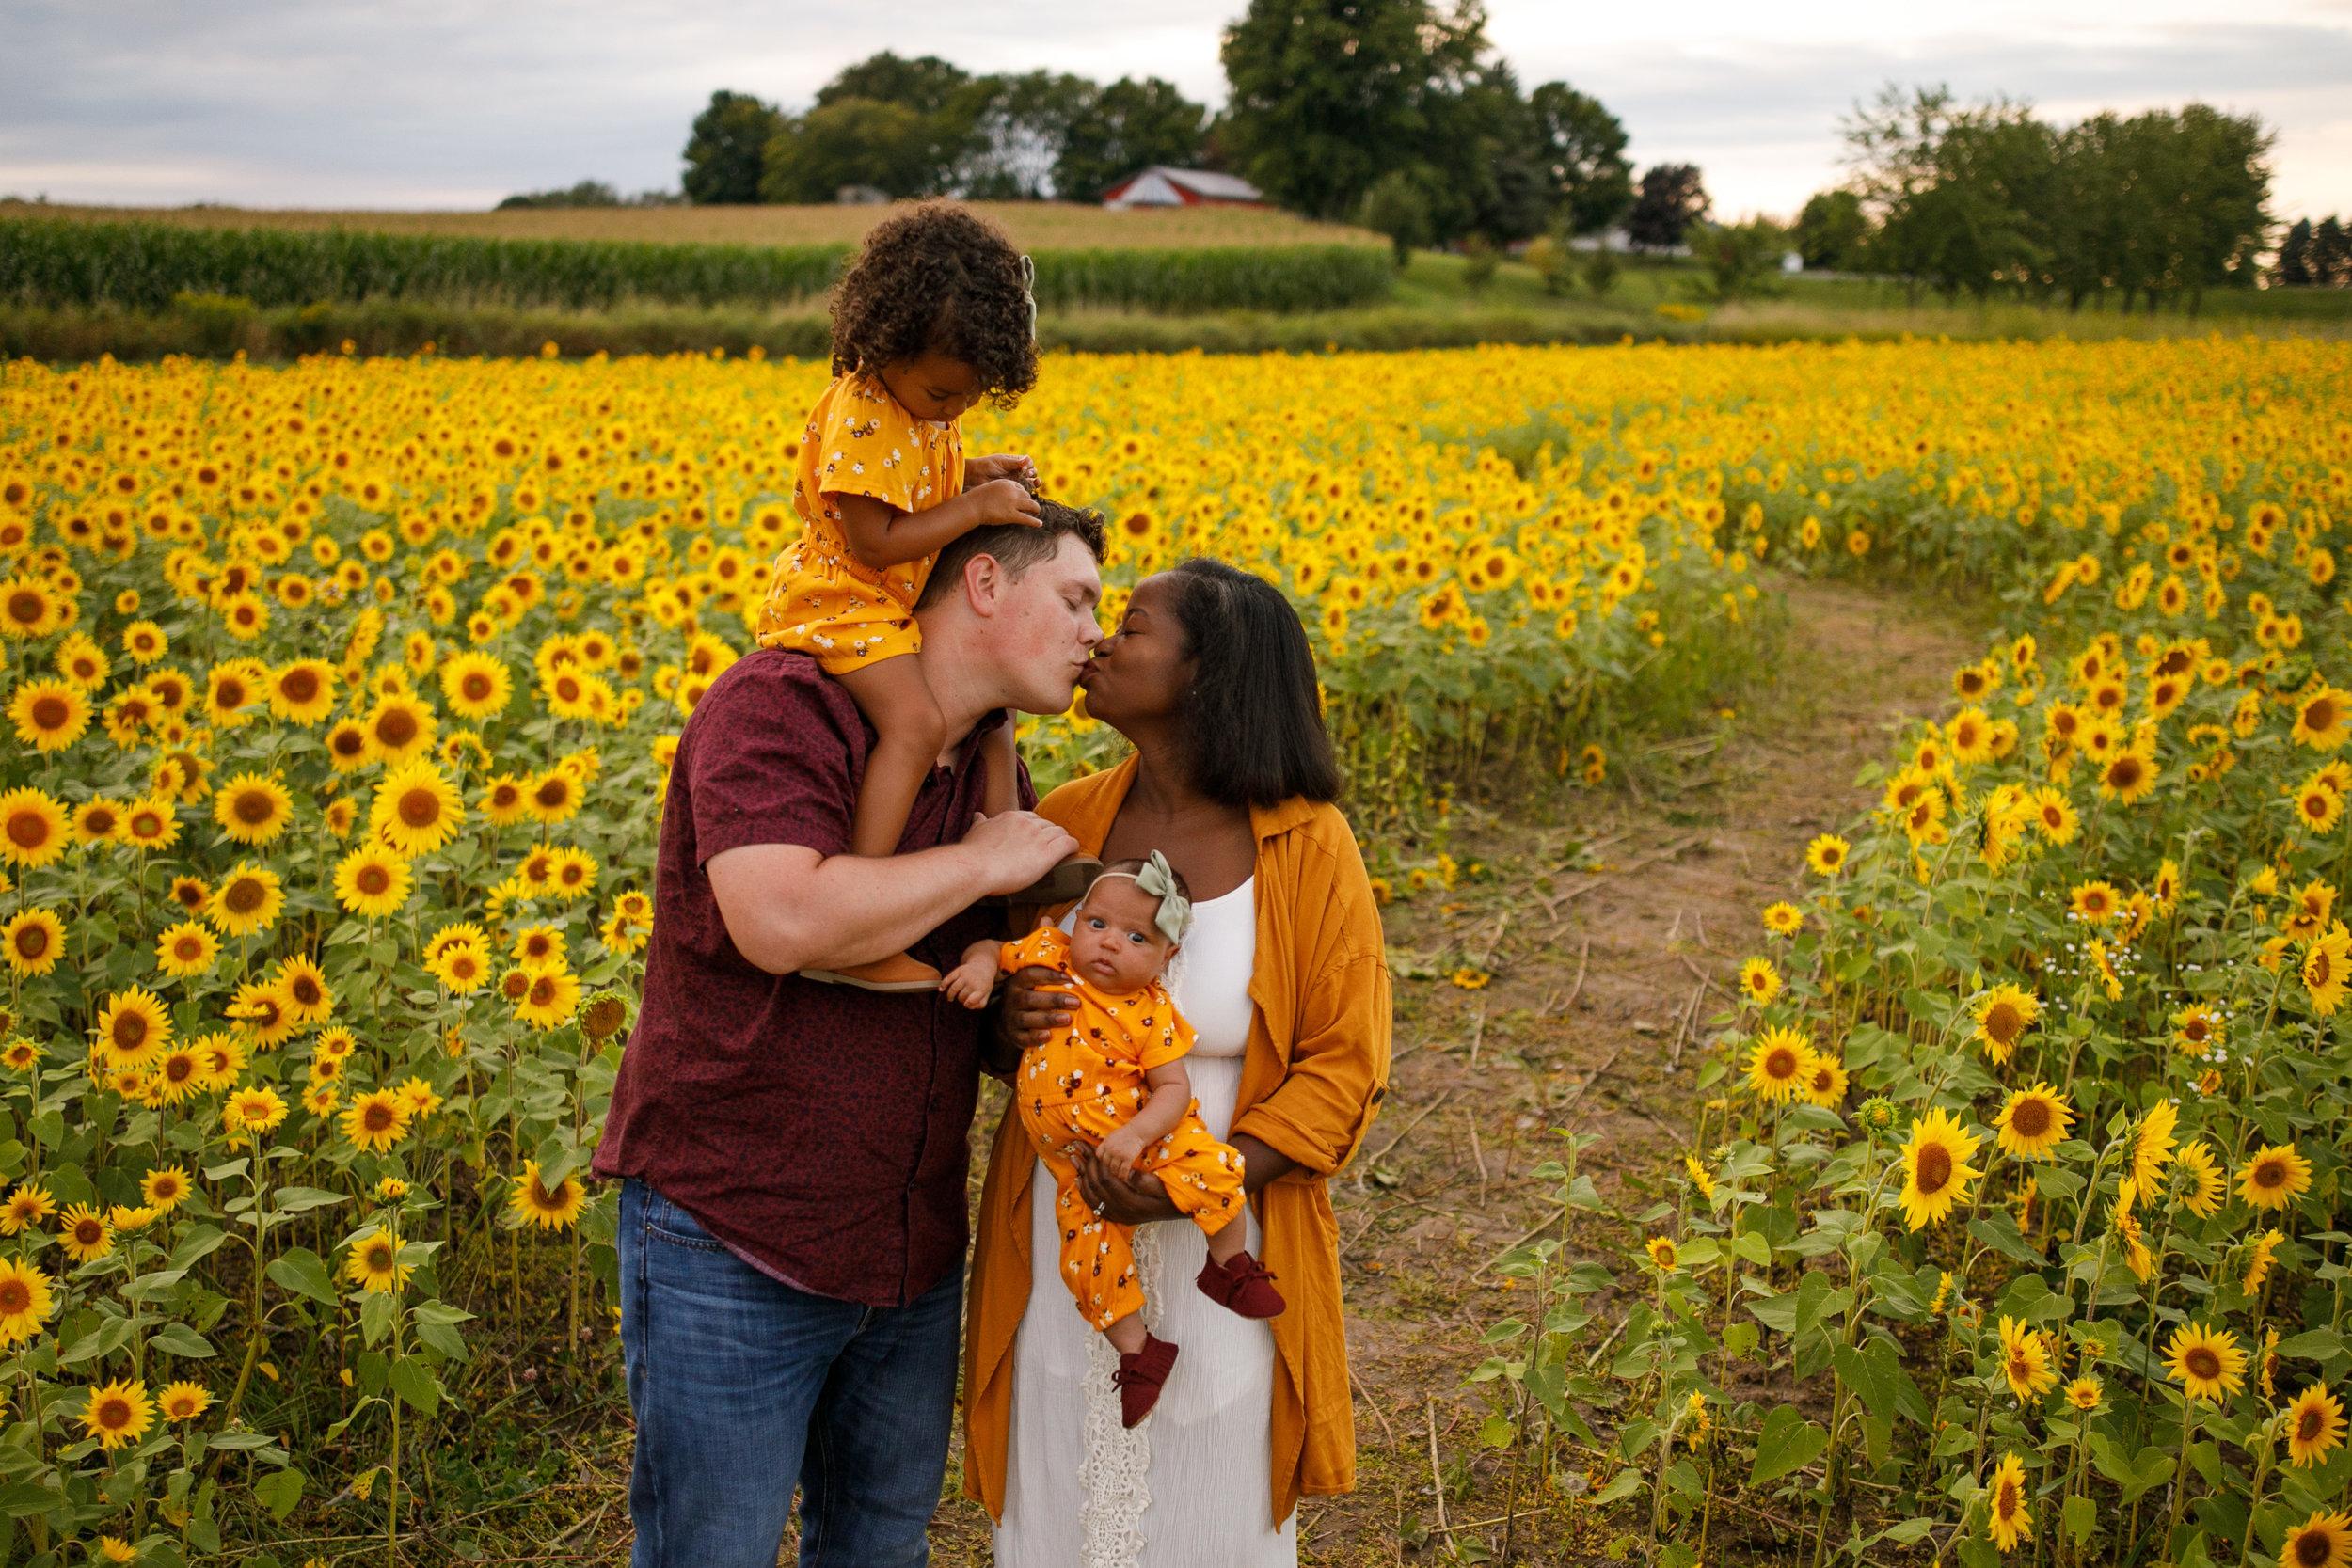 Morris Family Summer 2019 - Grand Rapids Photographer - Grand Rapids Family Photographer - Ed Dunneback and Girls - J Darling Photo 039.jpg